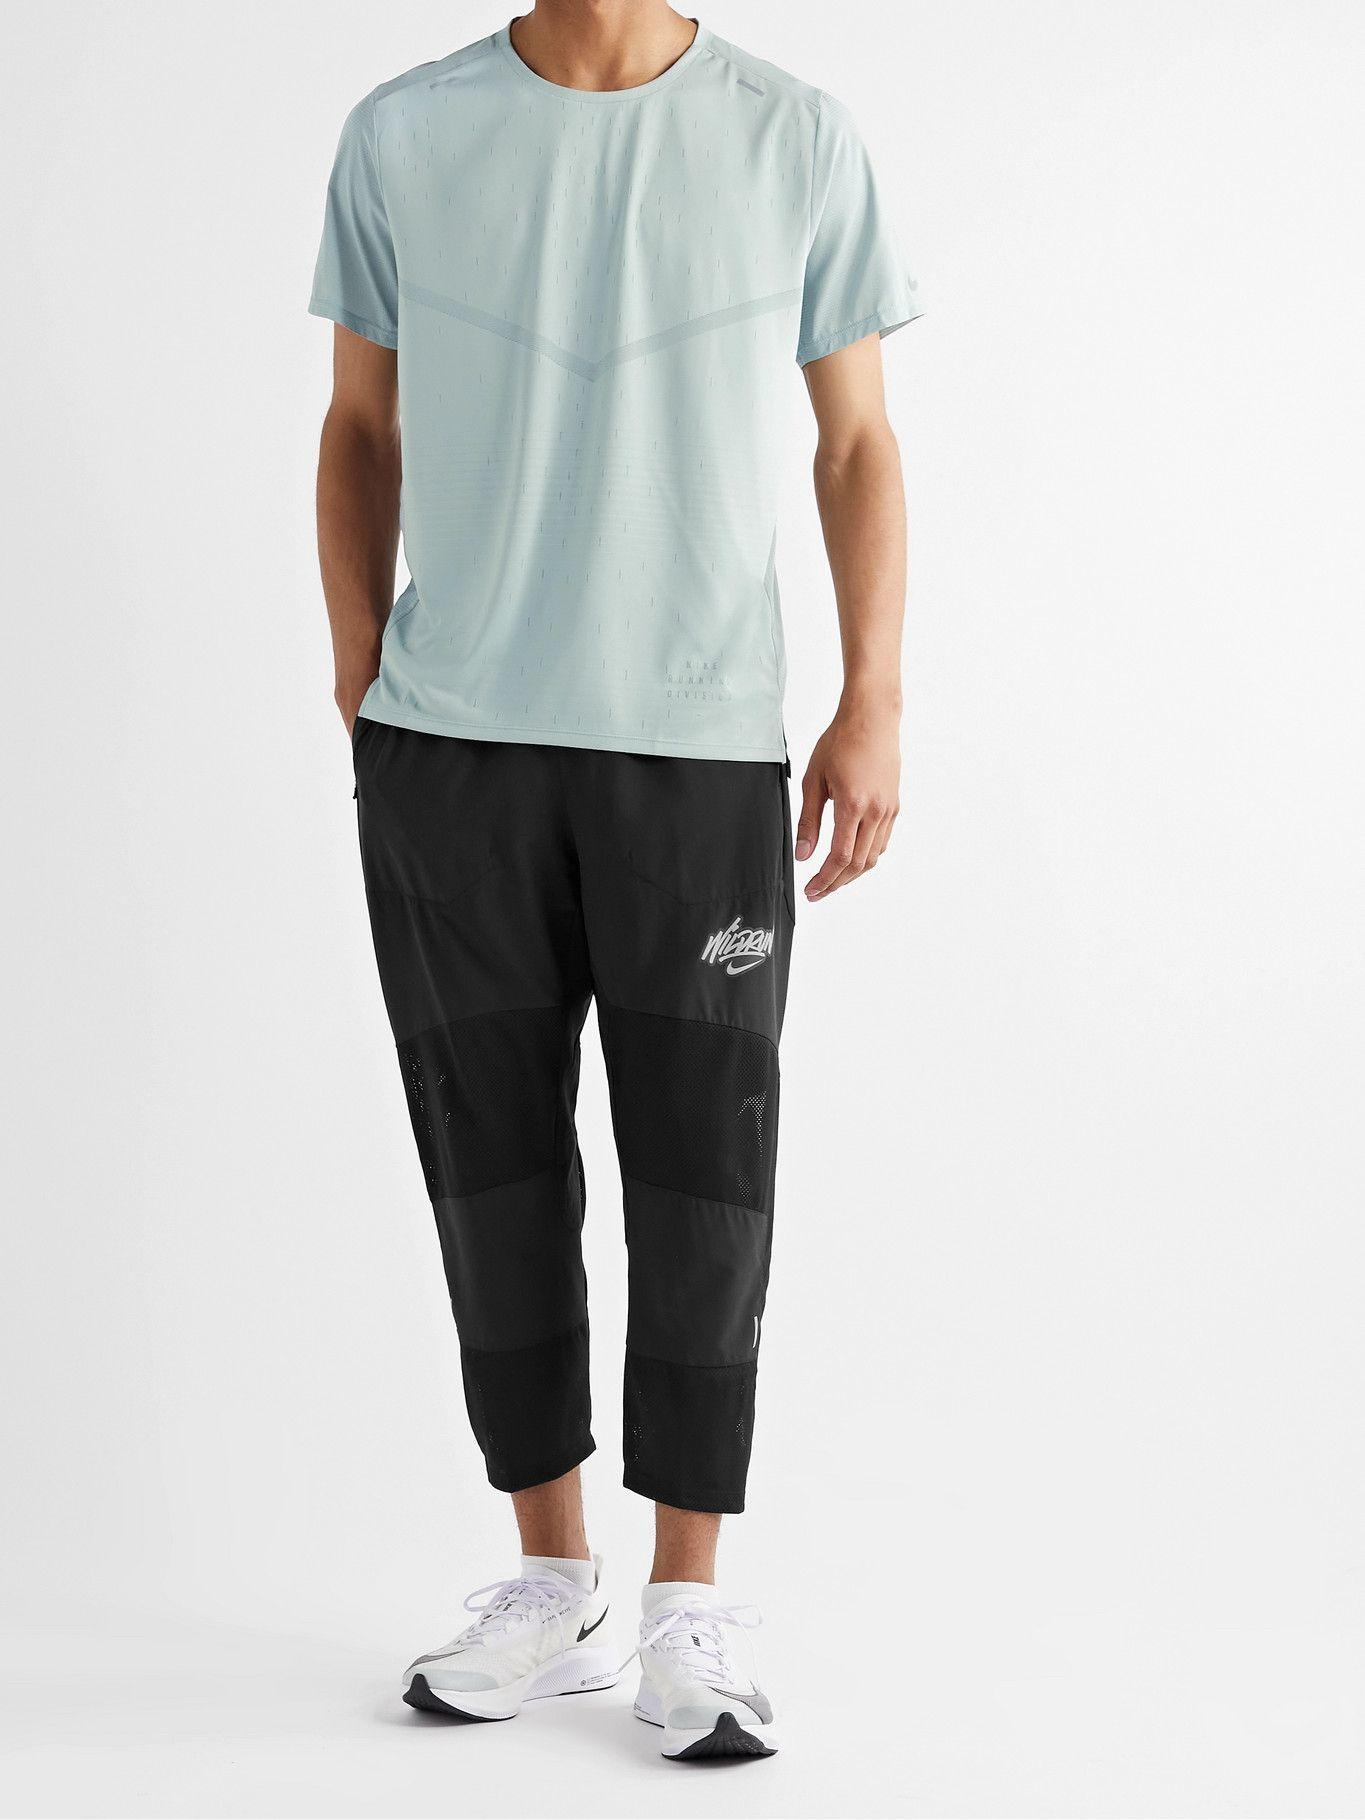 NIKE RUNNING - Phenom Elite Wild Run Tapered Cropped Dri-FIT Track Pants - Black